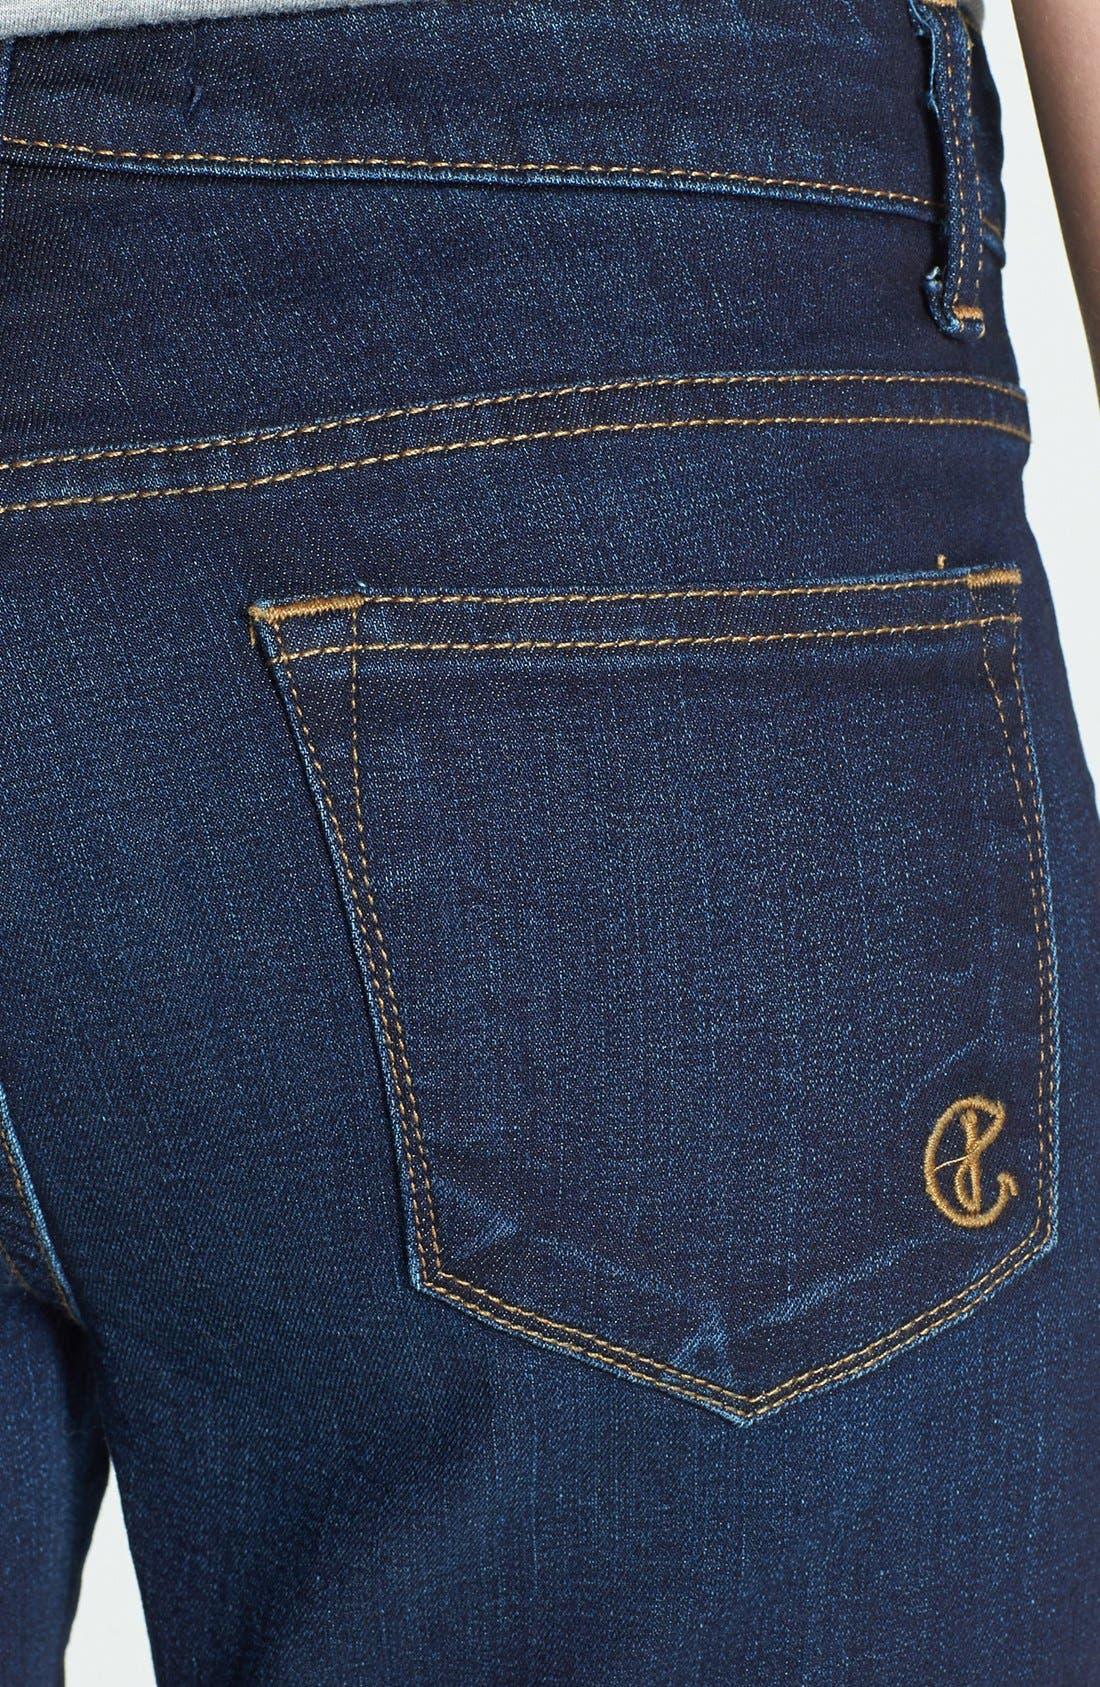 Alternate Image 3  - CJ by Cookie Johnson 'Believe' Crop Stretch Denim Skinny Jeans (Jeames)